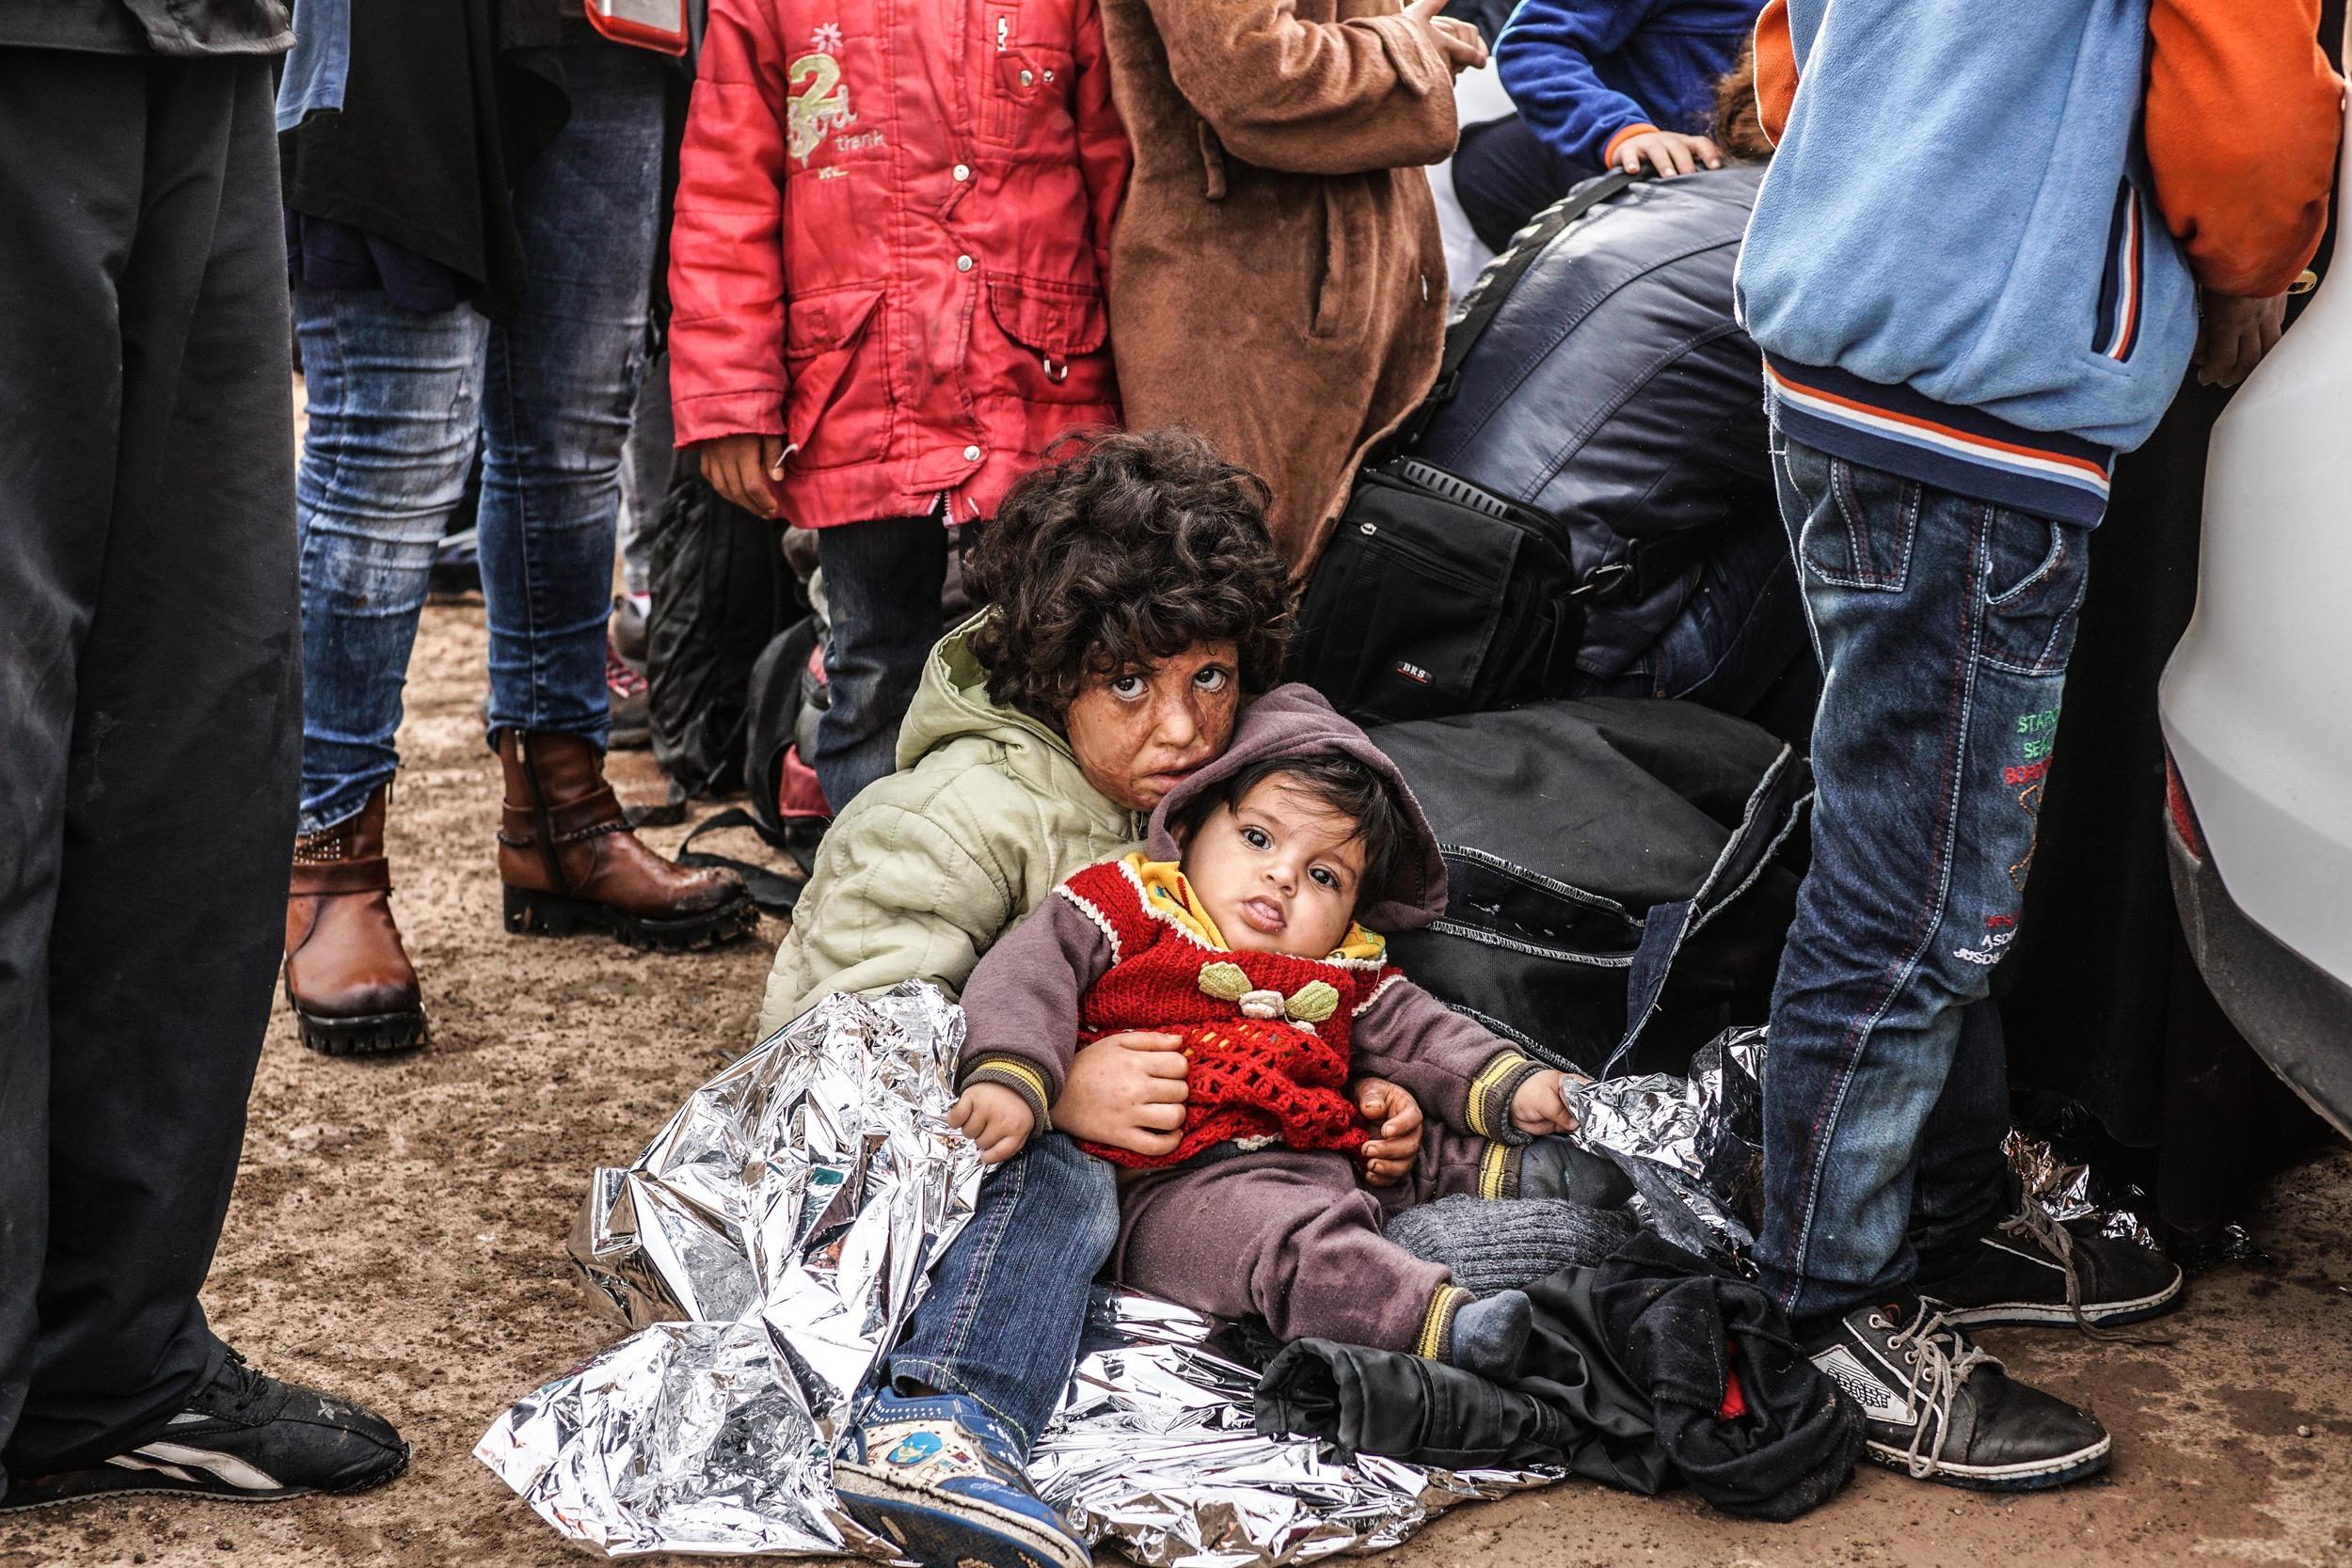 Syrian Refugee Crisis Lesbos Greece November 2015 19.jpg